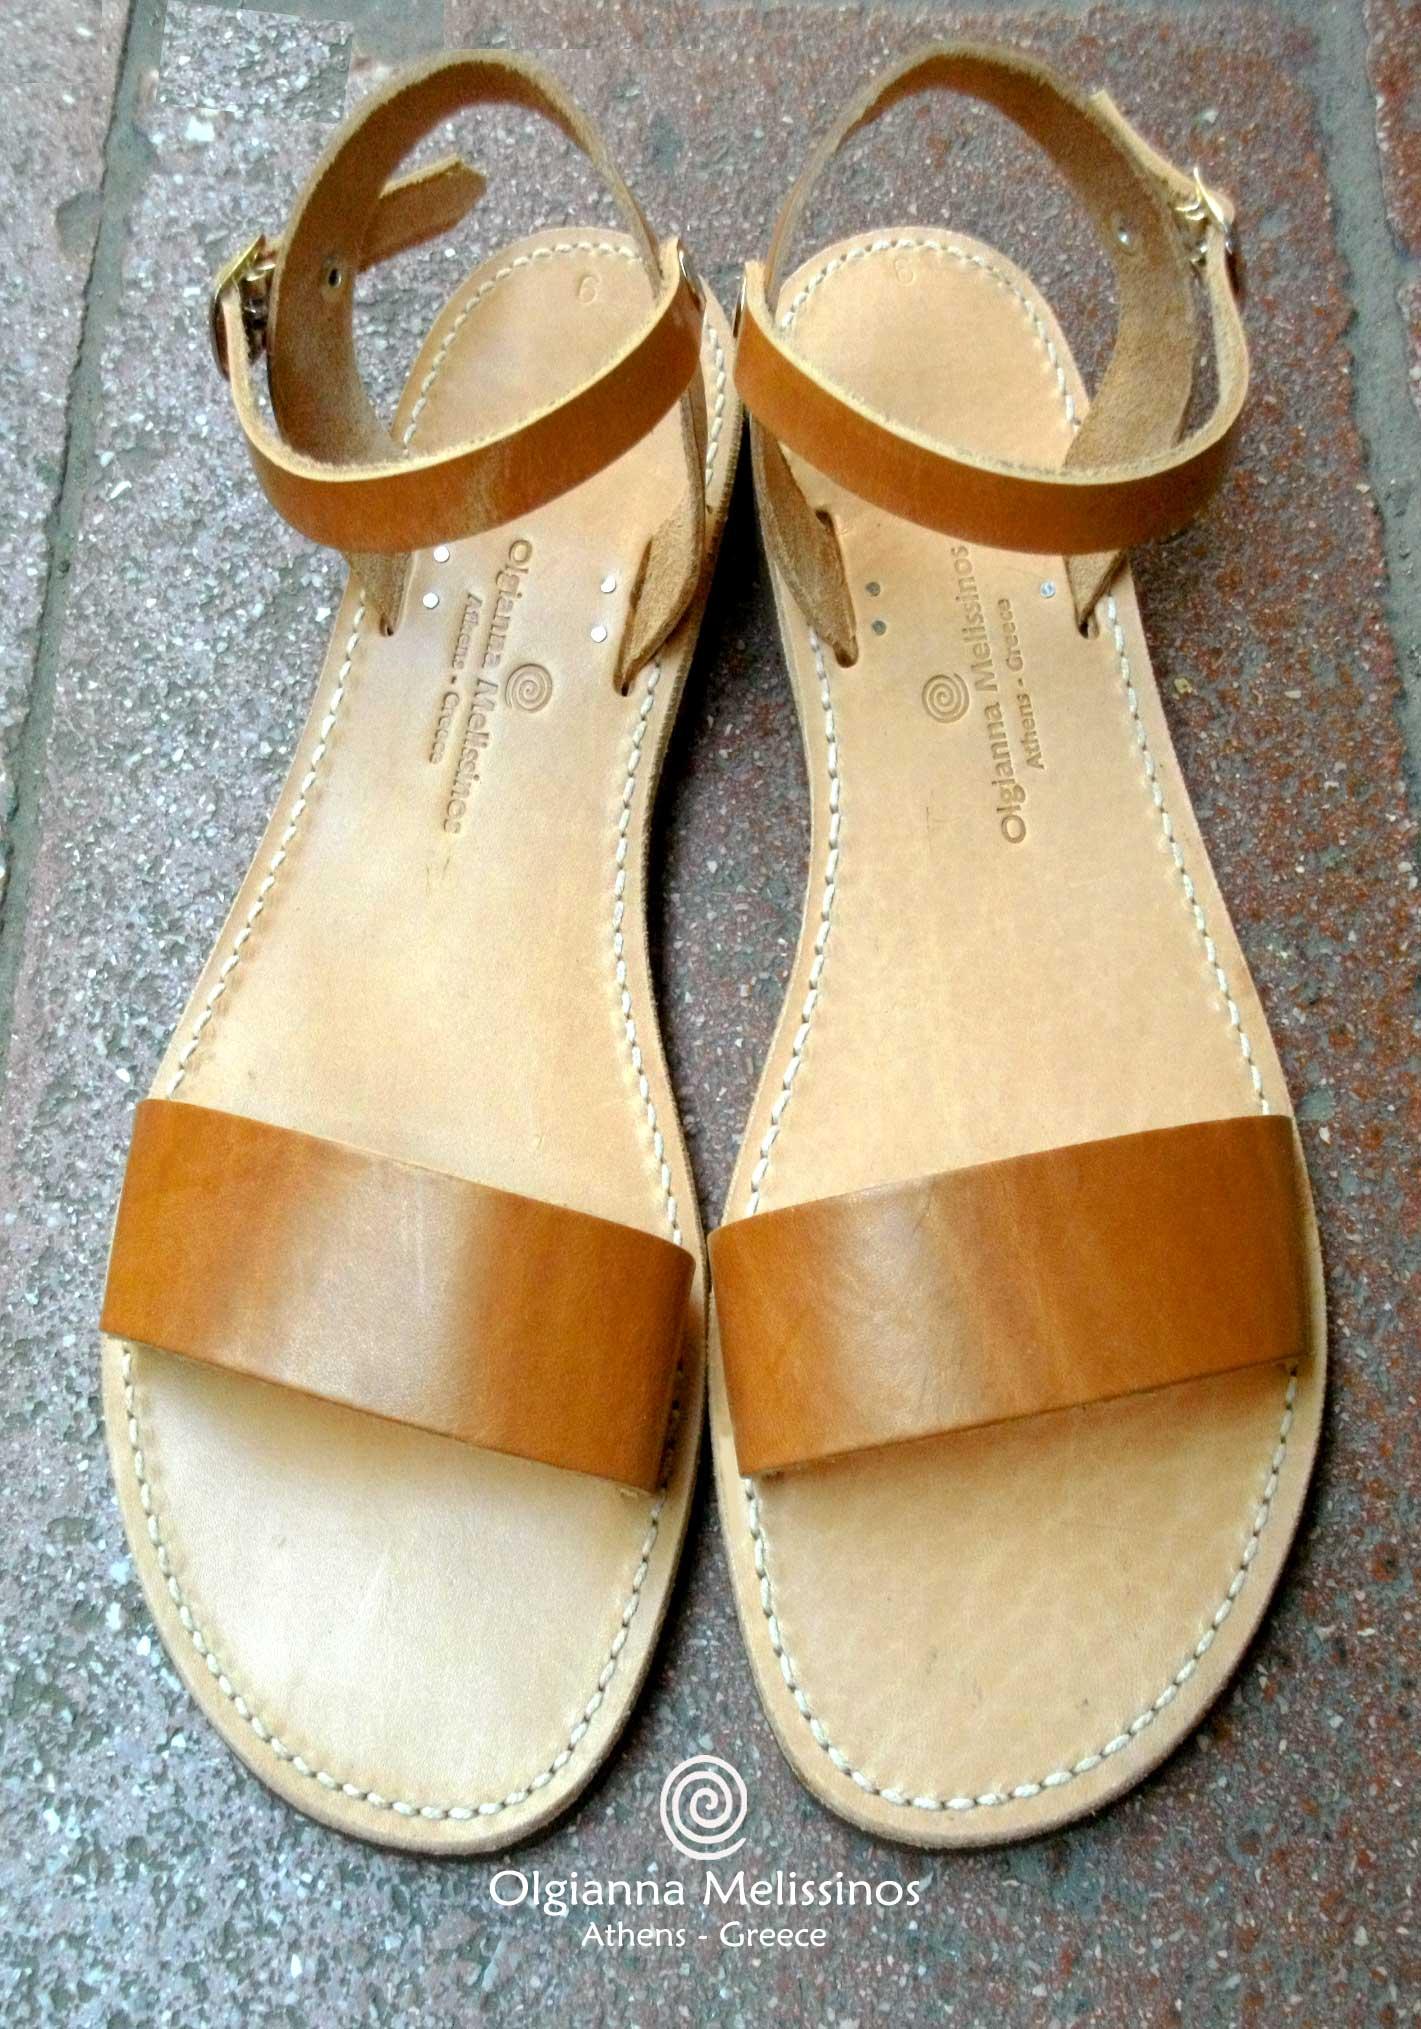 Handmade Sandals - RHEA 17/22